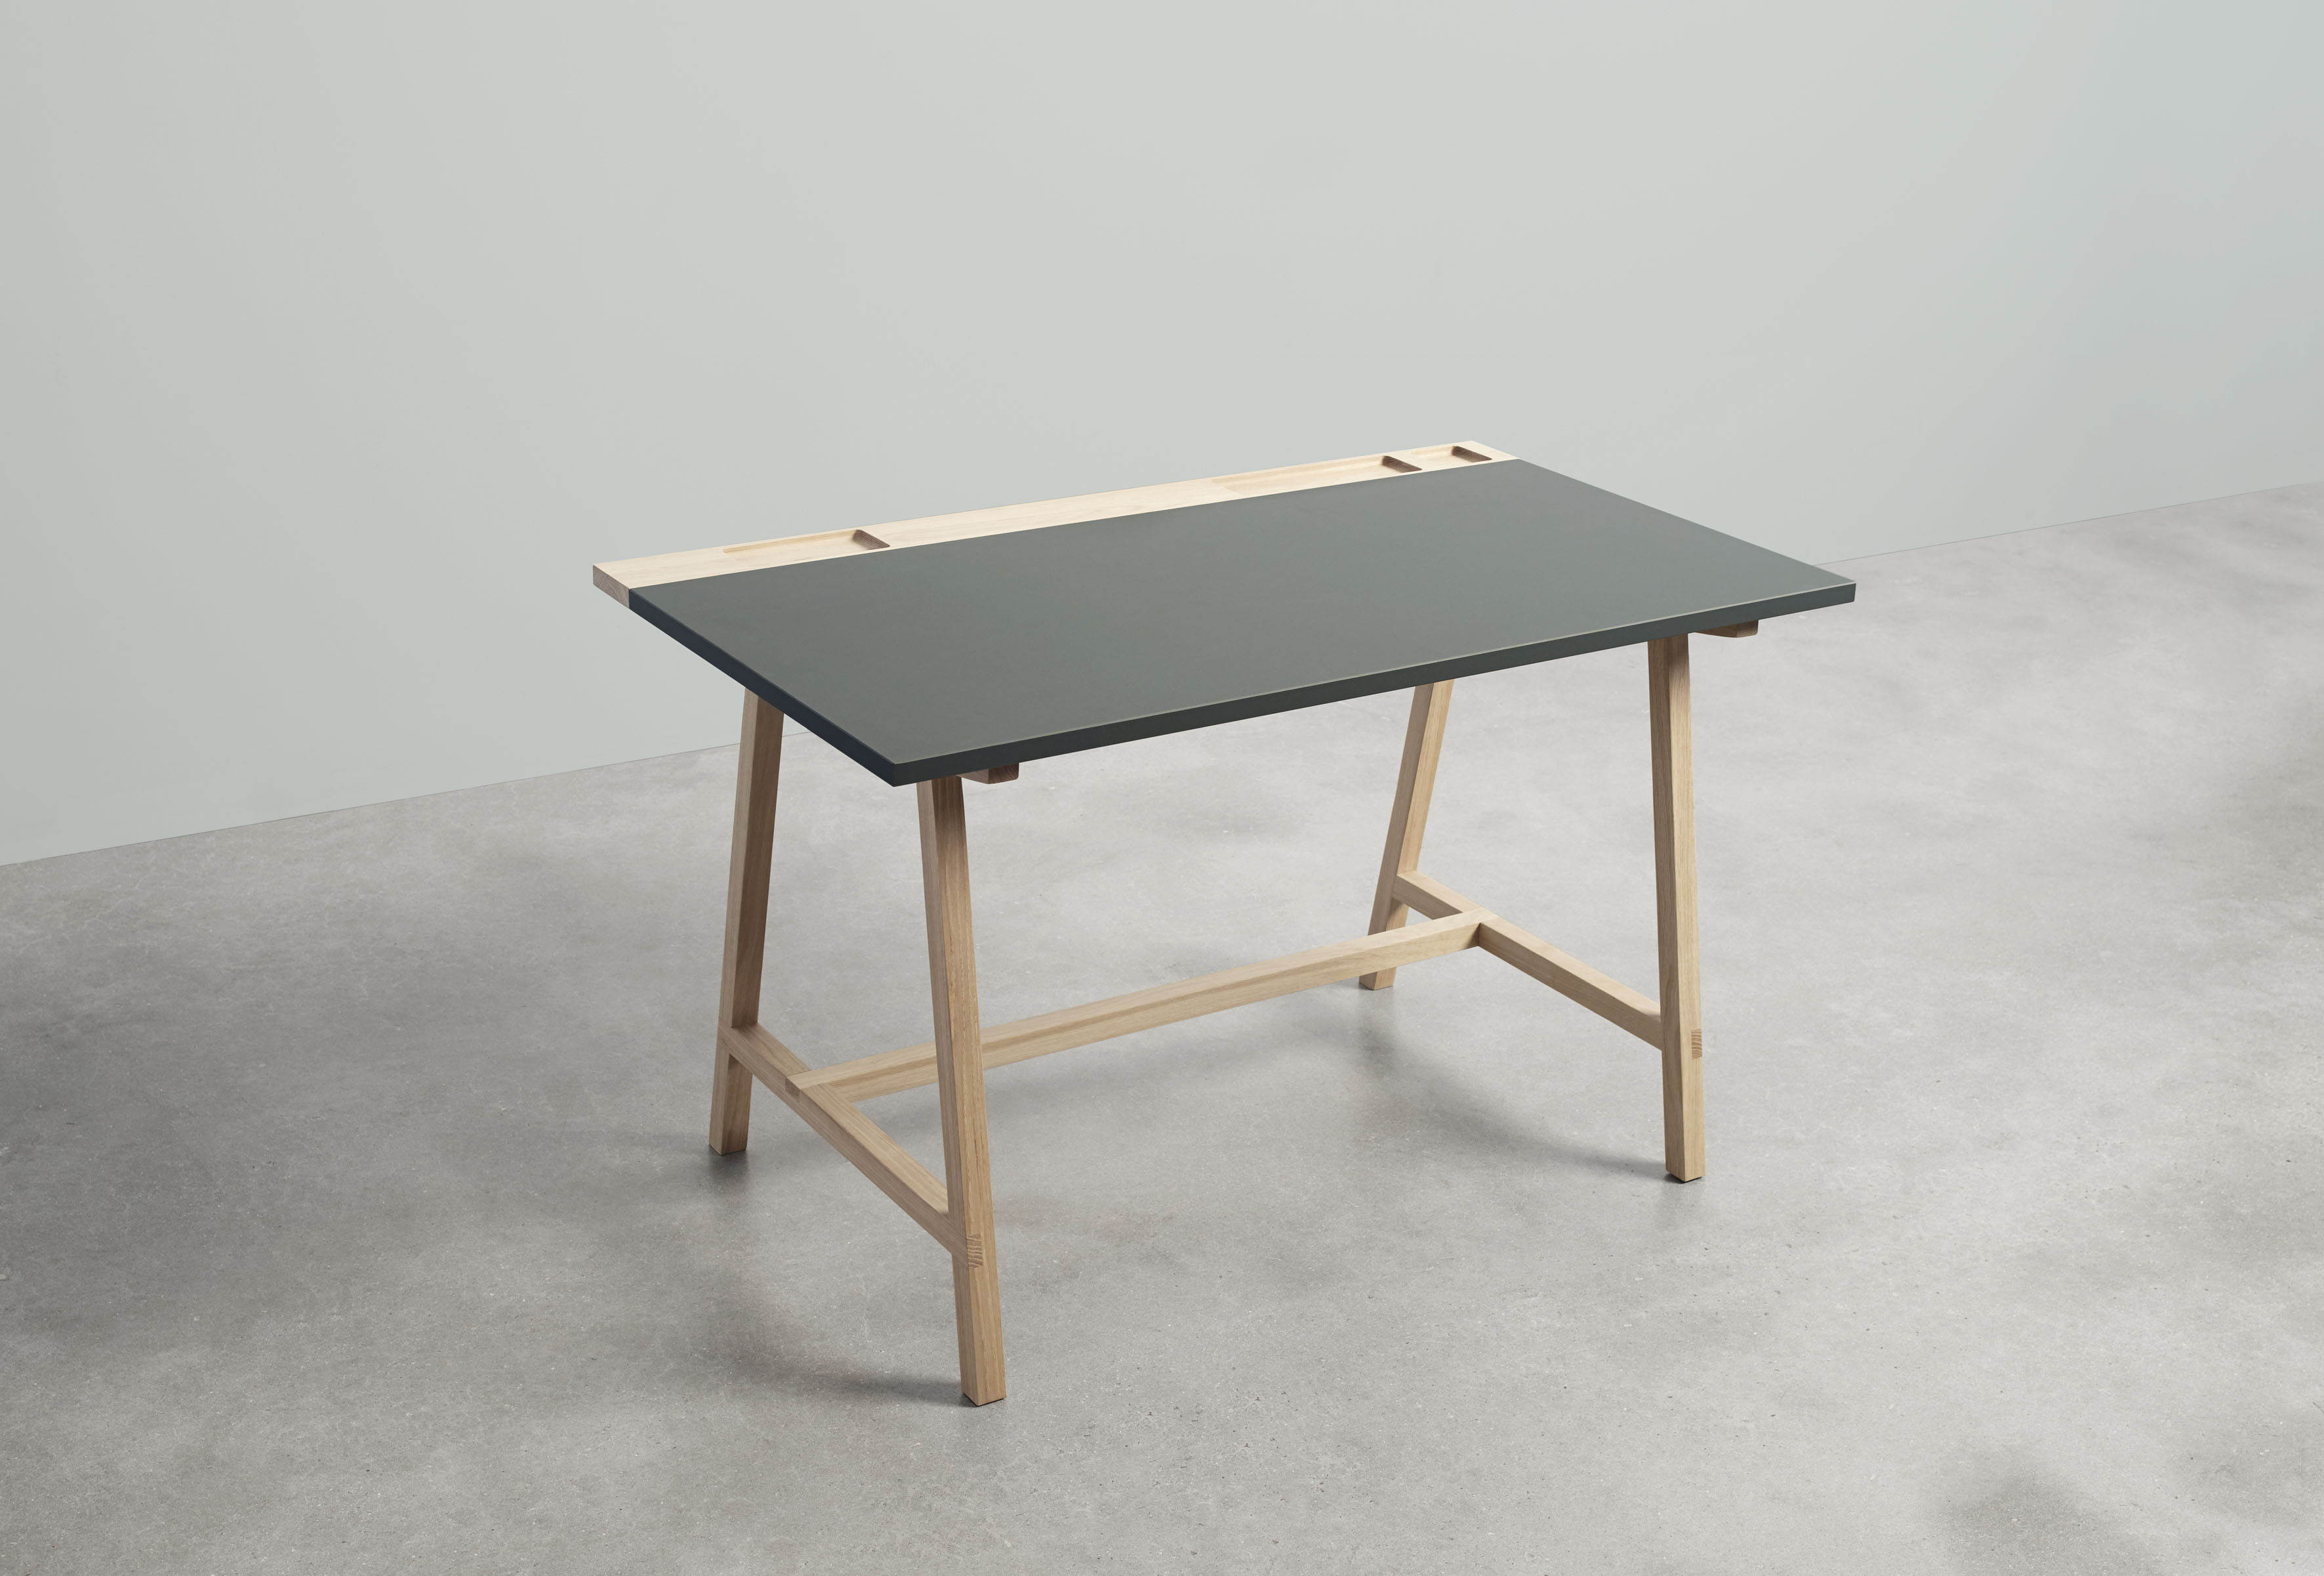 D1 Desk By ByKATO For Andersen Furniture